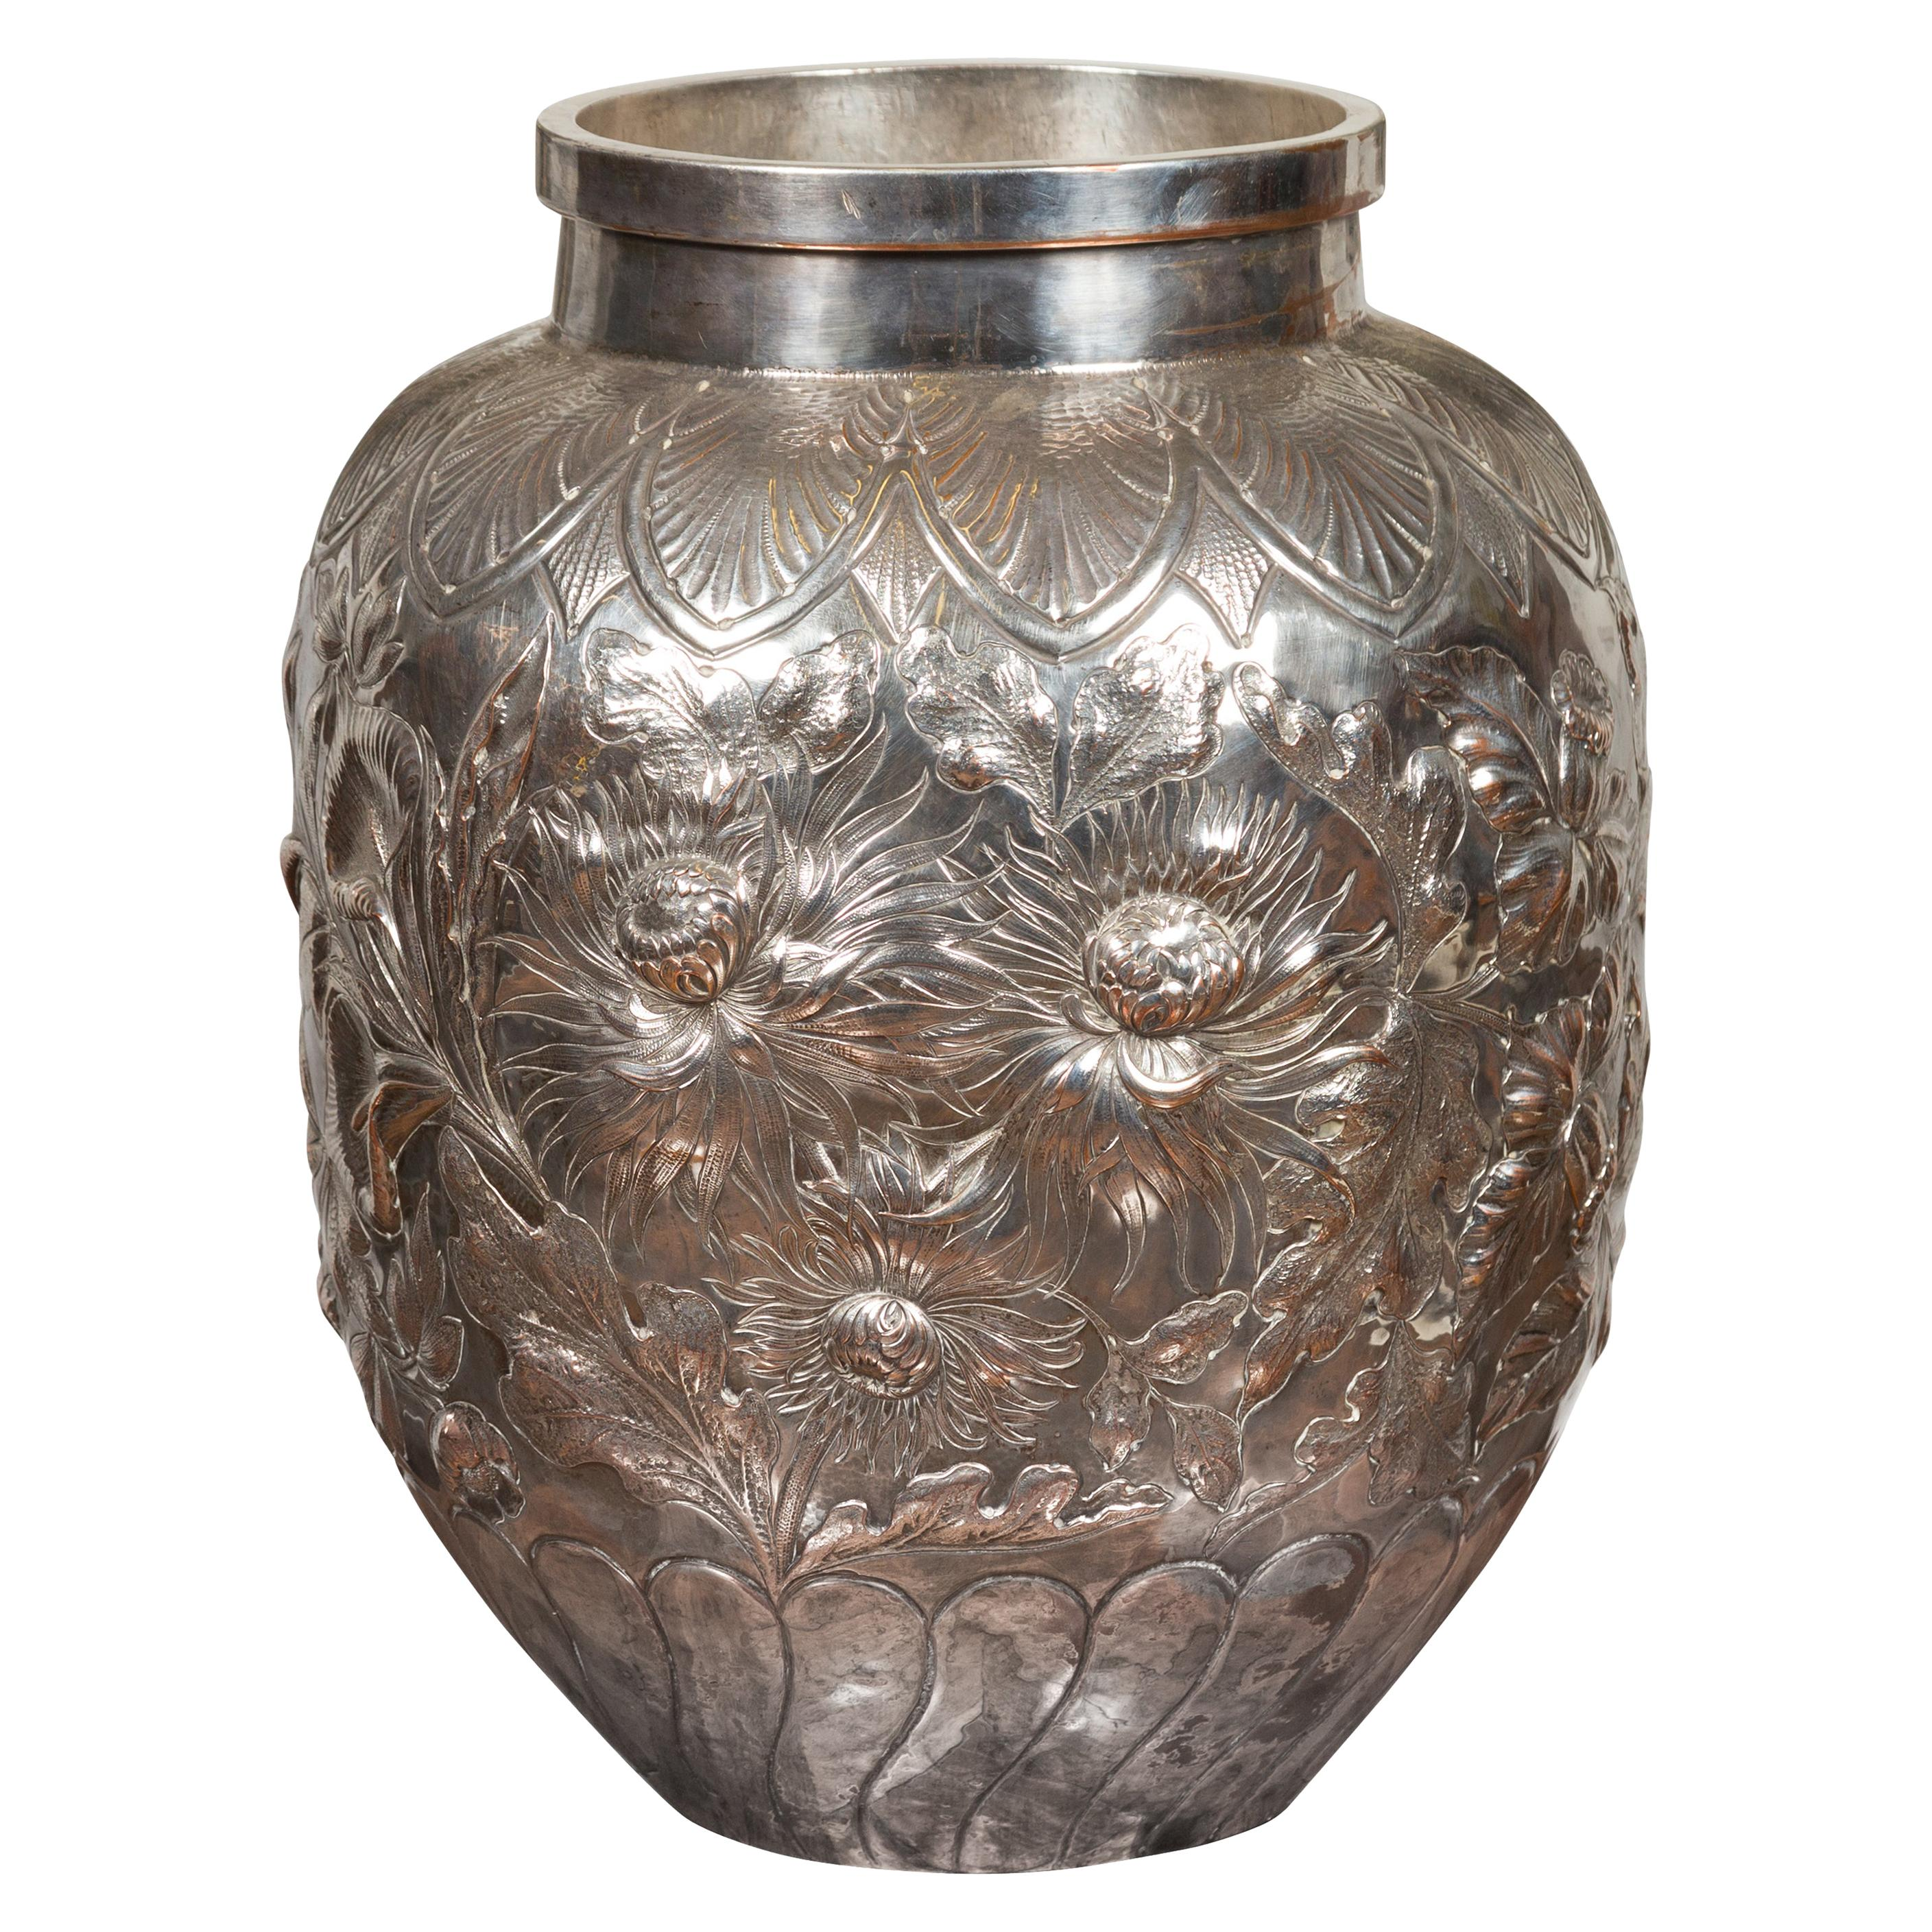 Large English 1900s Silver on Copper Vase with Floral Repoussé Motifs